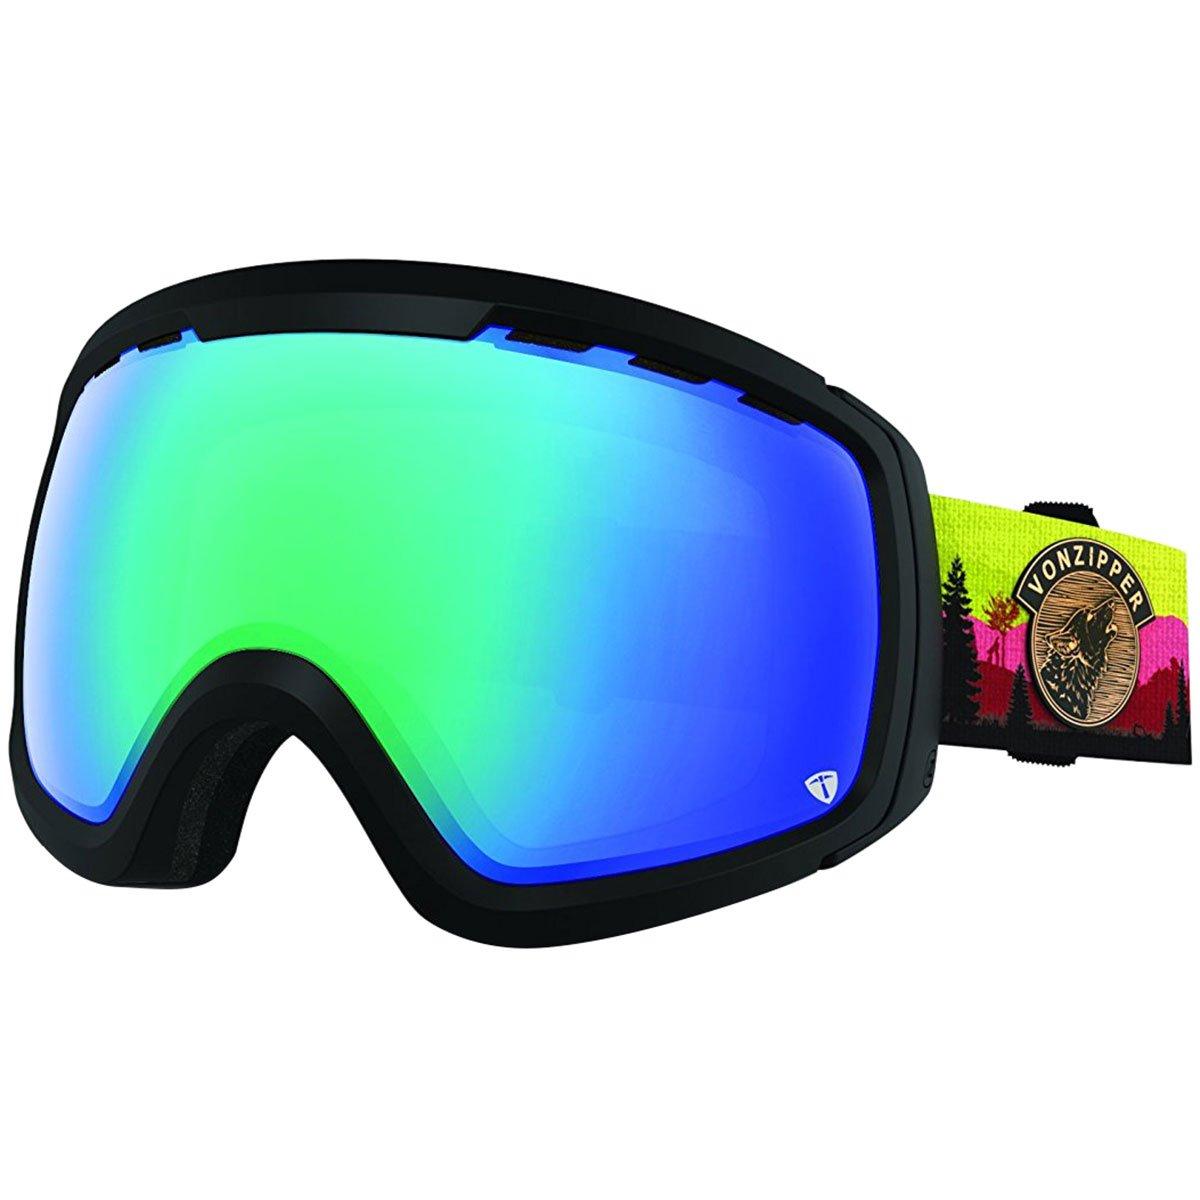 VonZipper Freenom NLS Mens Snow Racing Snowmobile Goggles Eyewear Halldor//Persimmon Chrome//One Size Fits All 5559129883